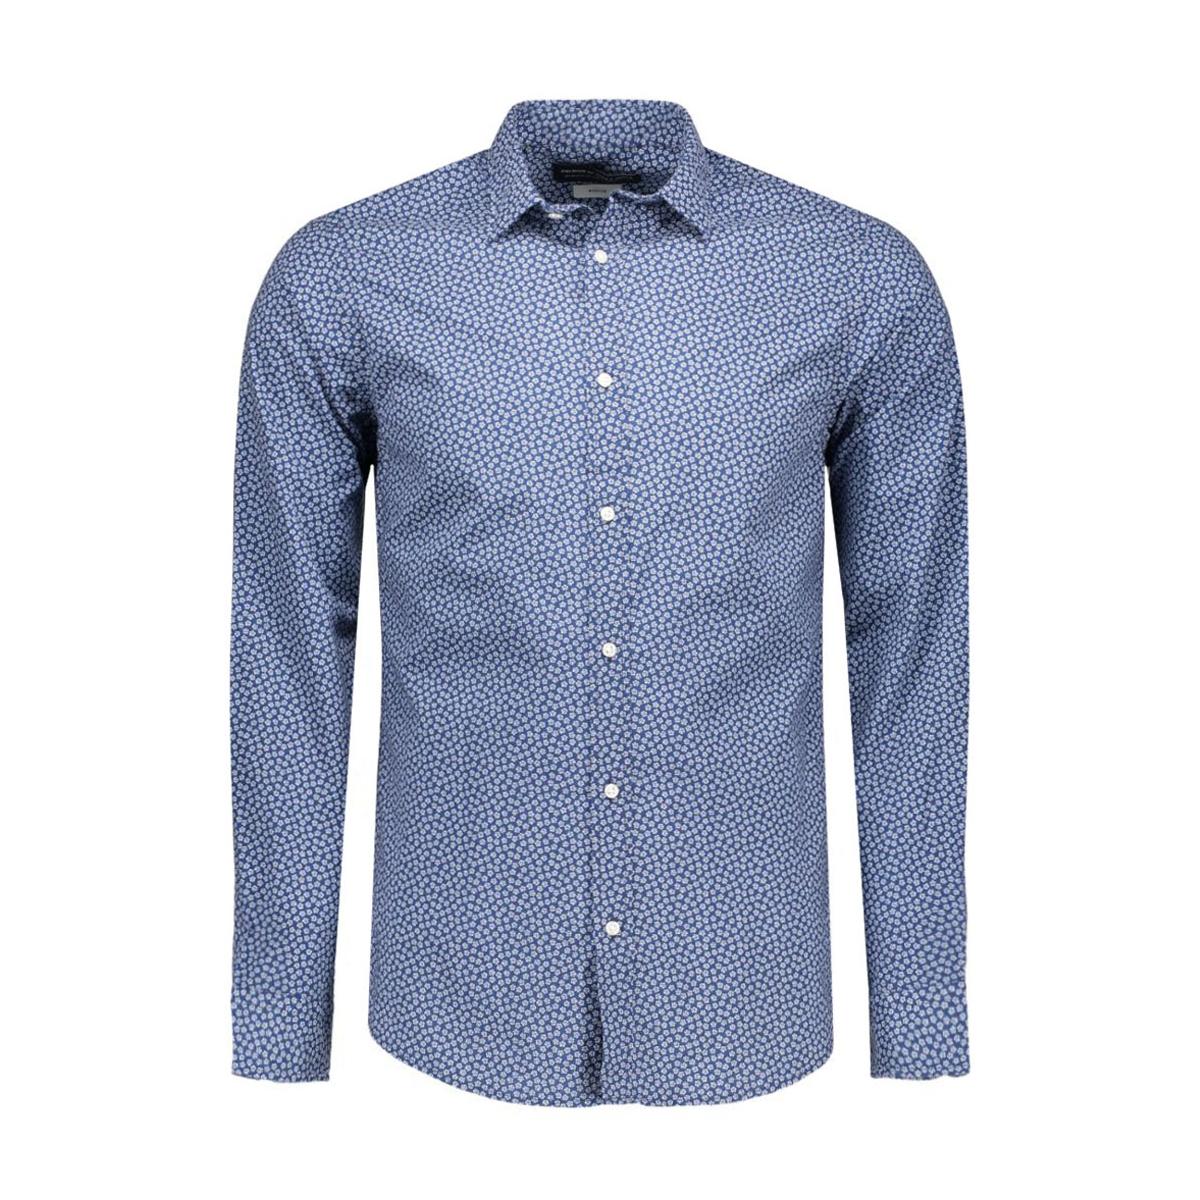 jprnewcastle shirt l/s plain 12108895 jack & jones overhemd navy blazer